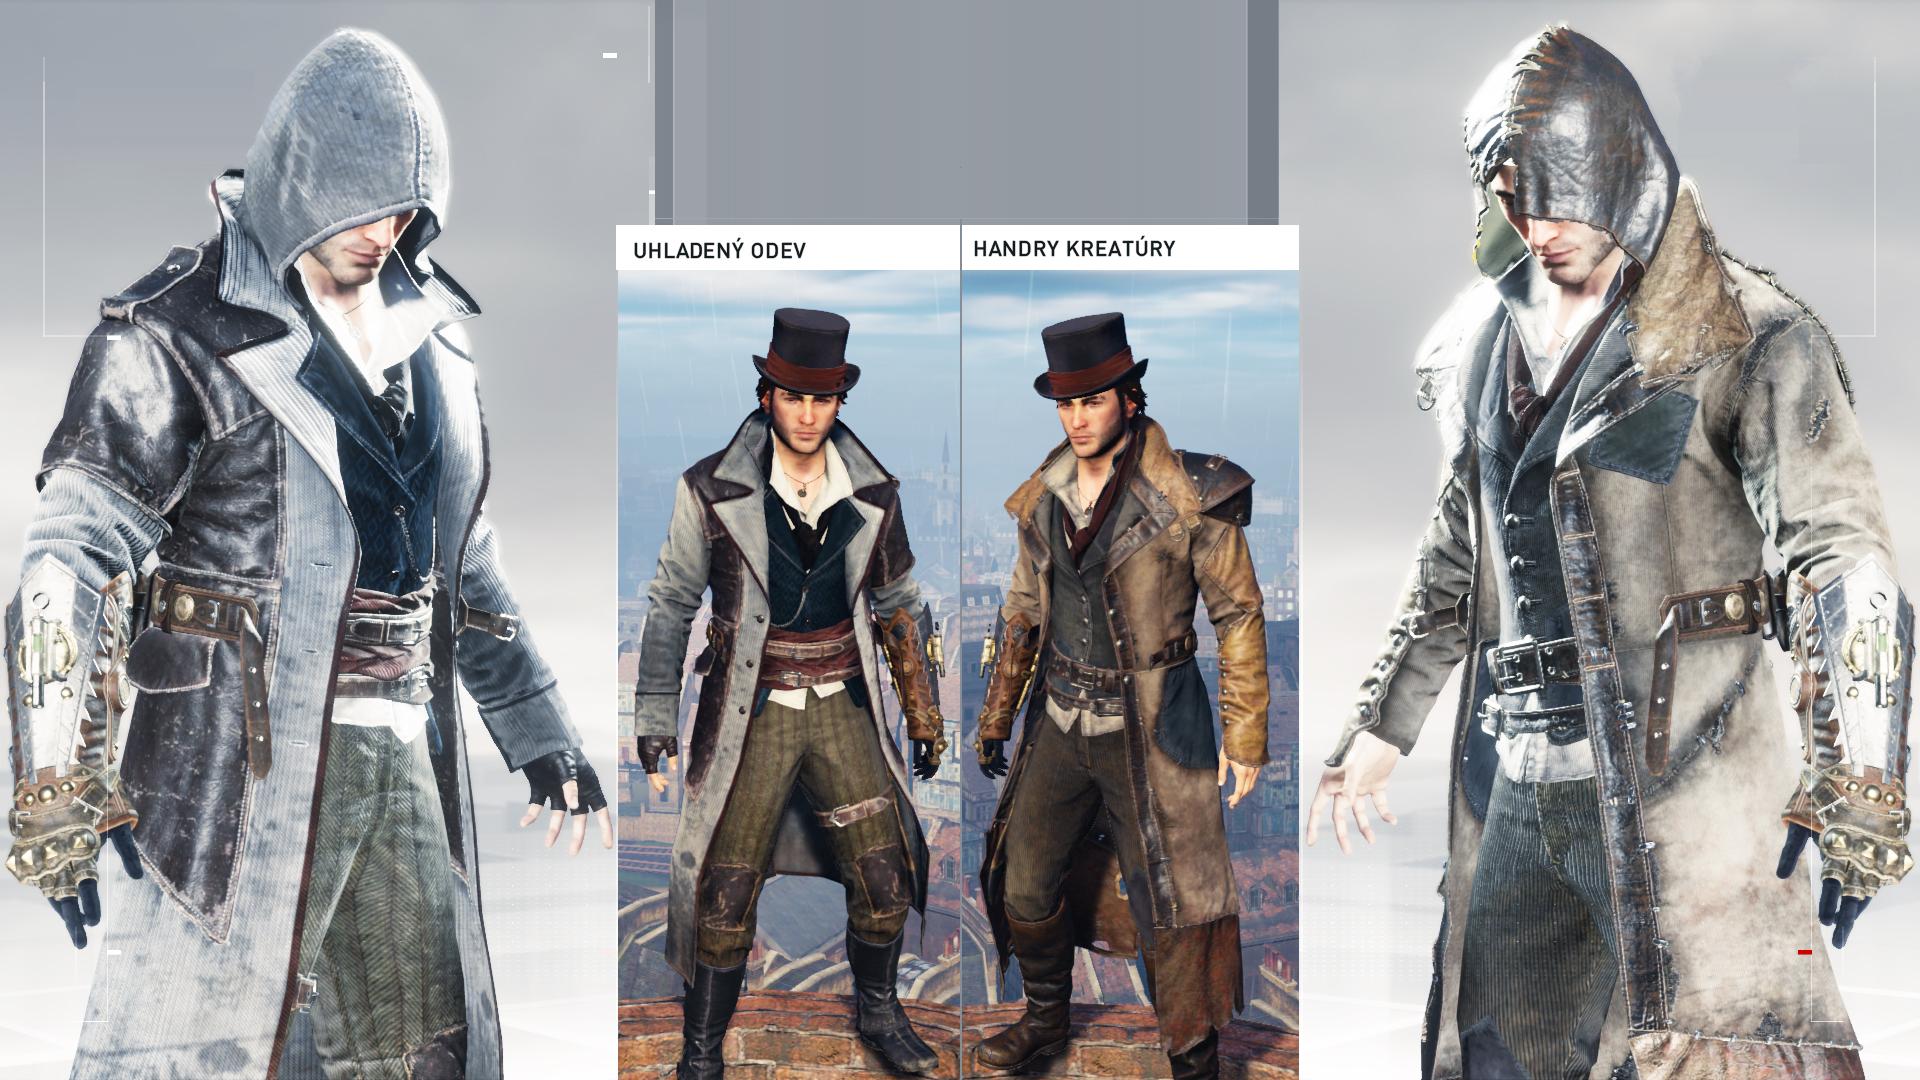 0037b863393b3 Steam Community :: Guide :: Návod na hru: Assassin's Creed Syndicate